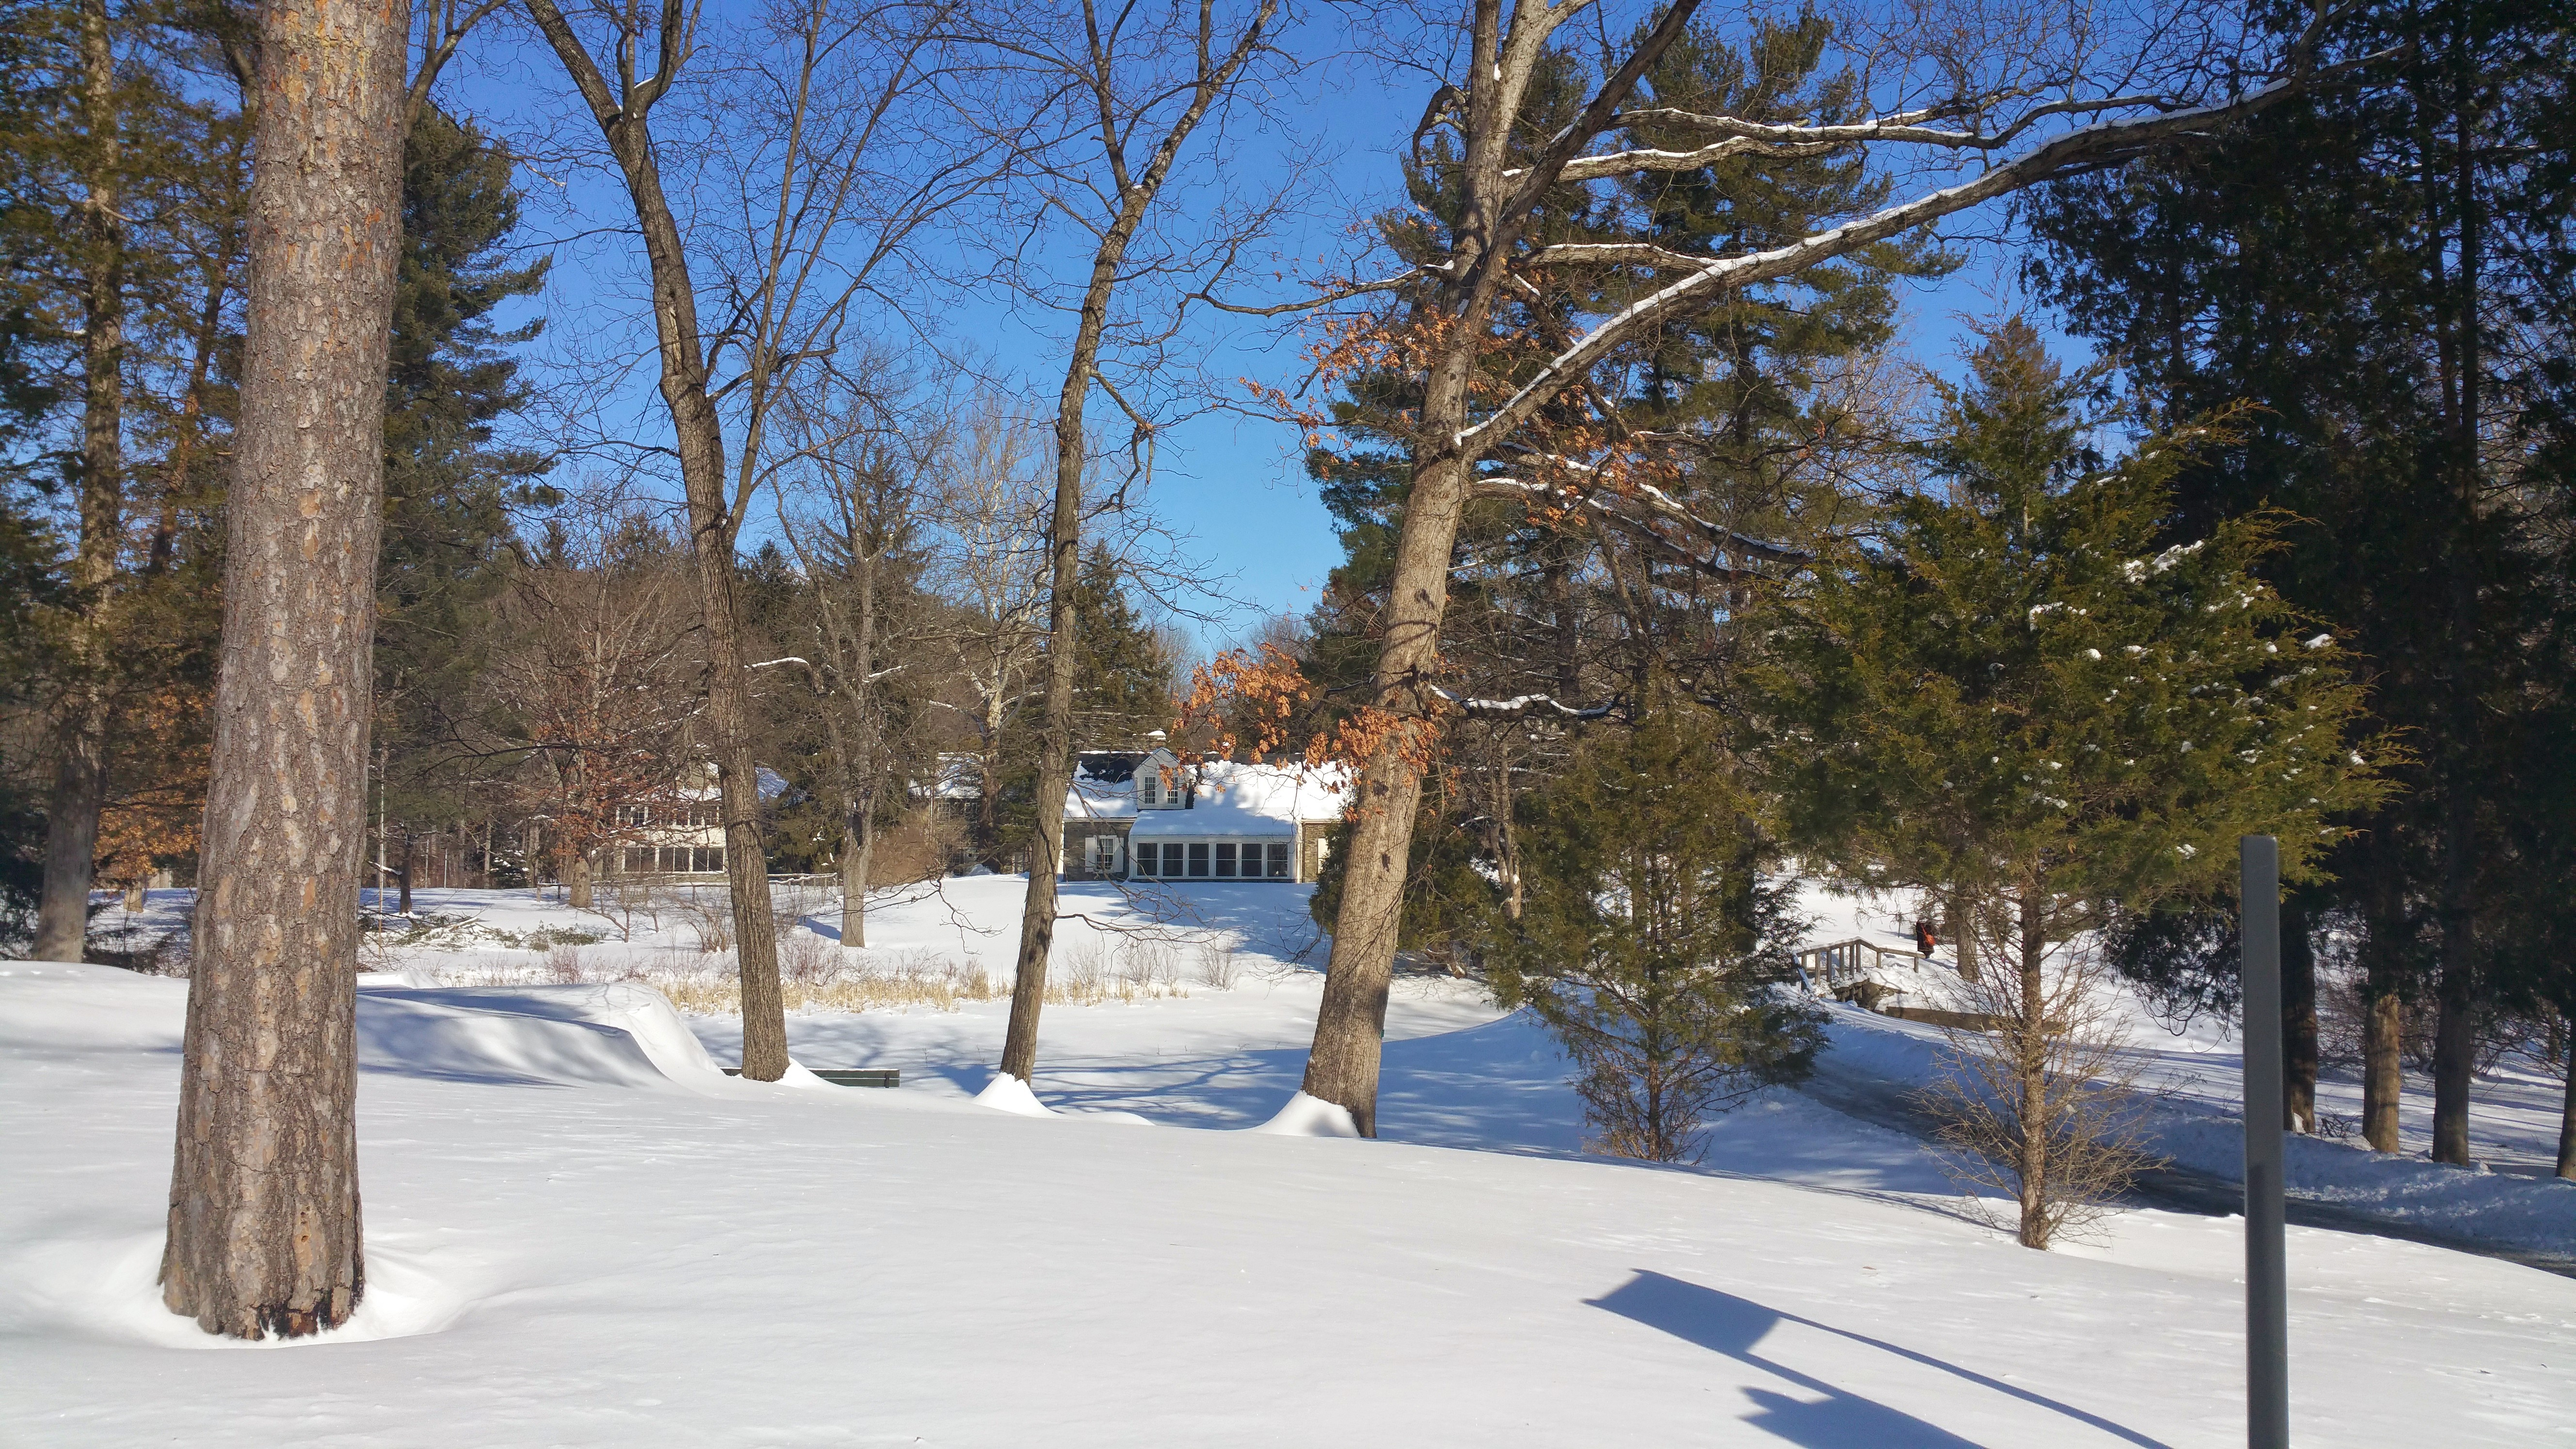 Eleanor Roosevelt's Home, Val-Kill